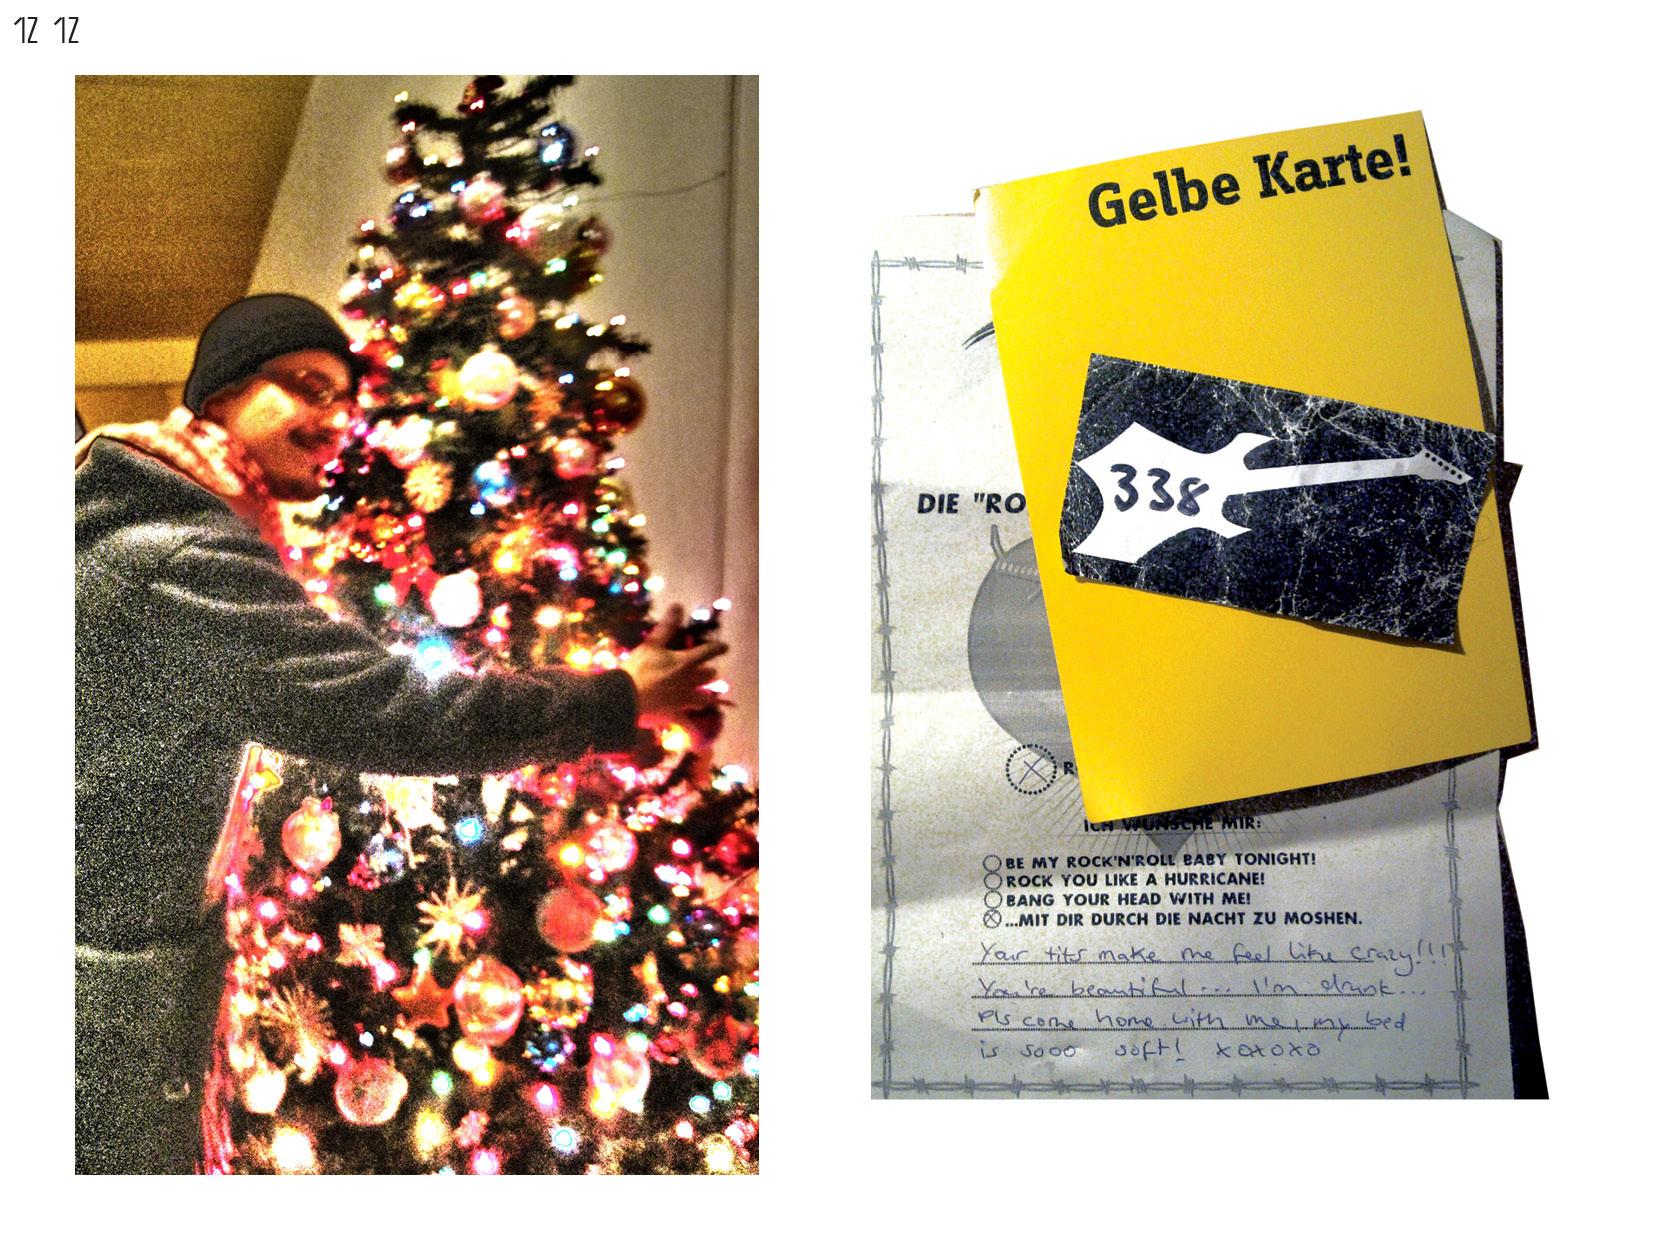 Gerrit-Schweiger-Dialog-Städte-Paris-Berlin-Jessica-Blank-Experiment-Fotoserie-Tagebuch-visuelle-Kommunikation-53